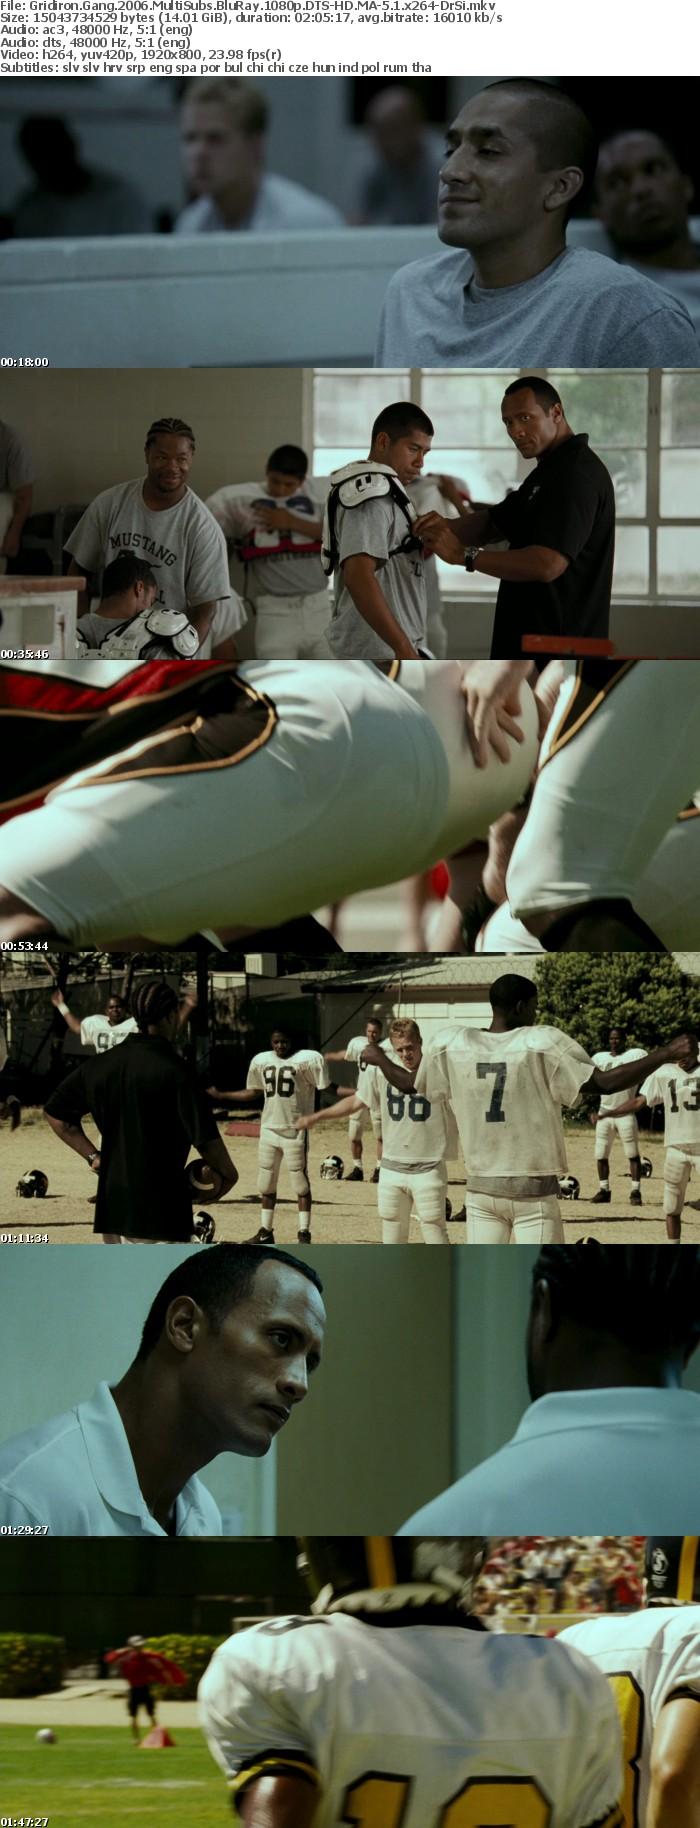 Gridiron Gang 2006 MultiSubs BluRay 1080p DTS-HD MA-5 1 x264-DrSi